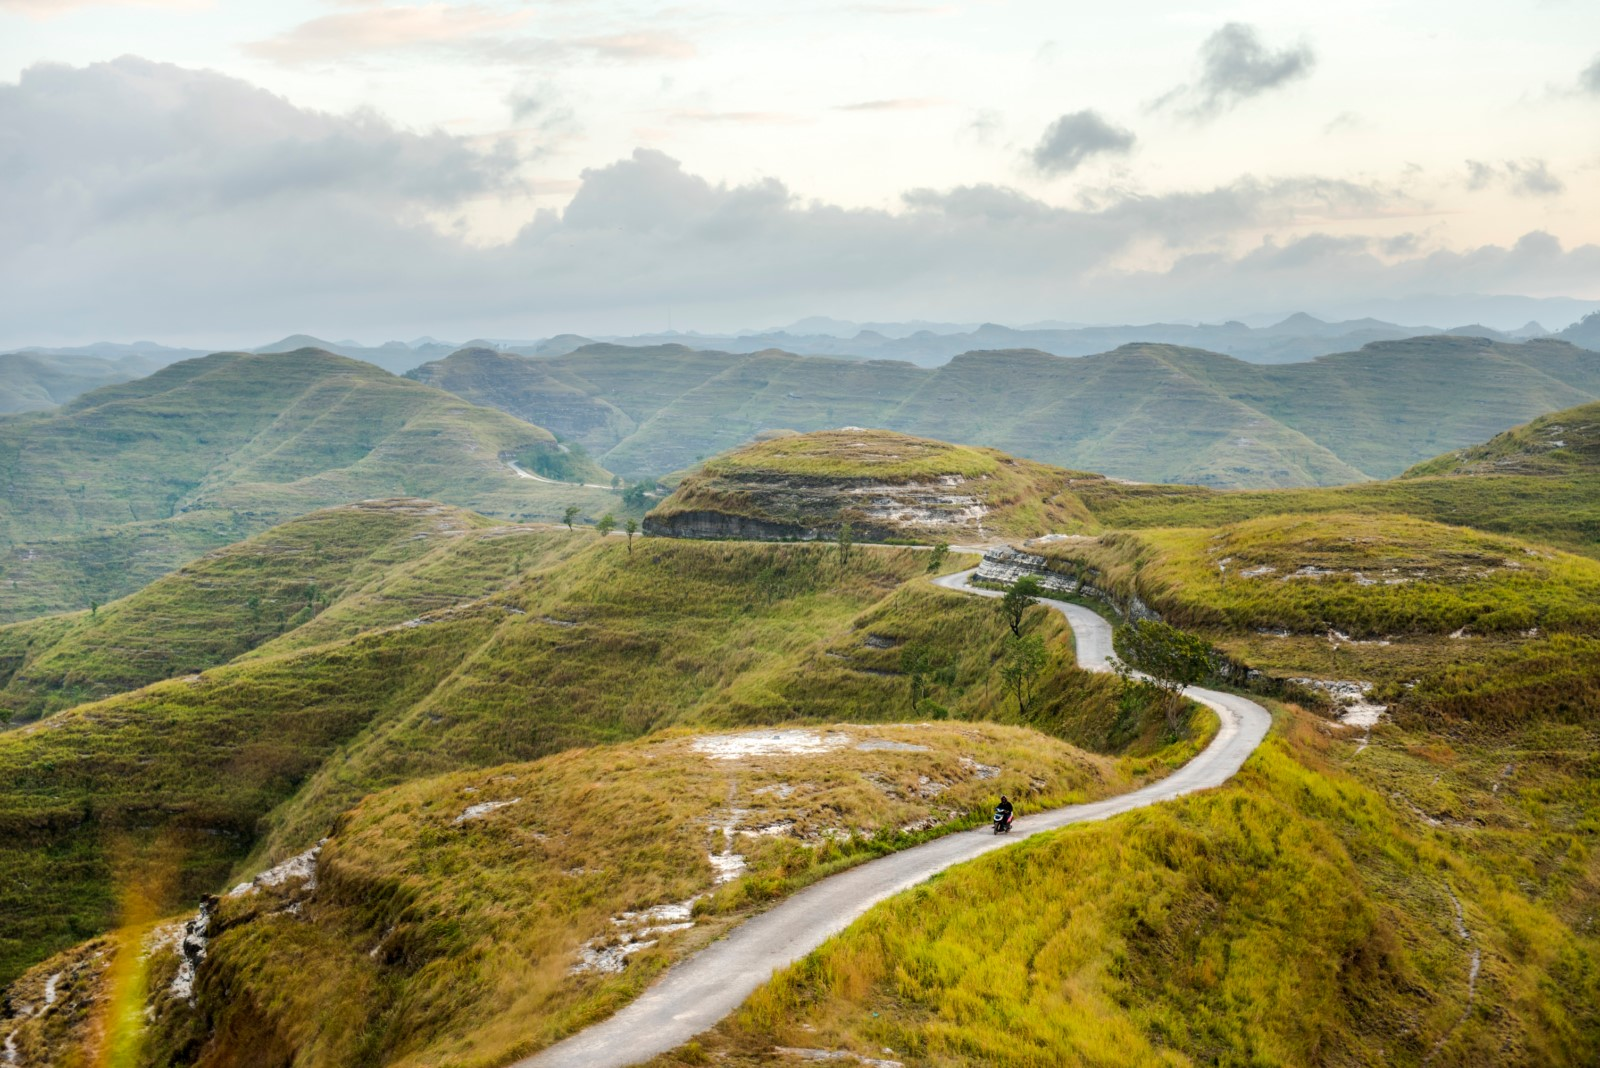 Green hills sumba